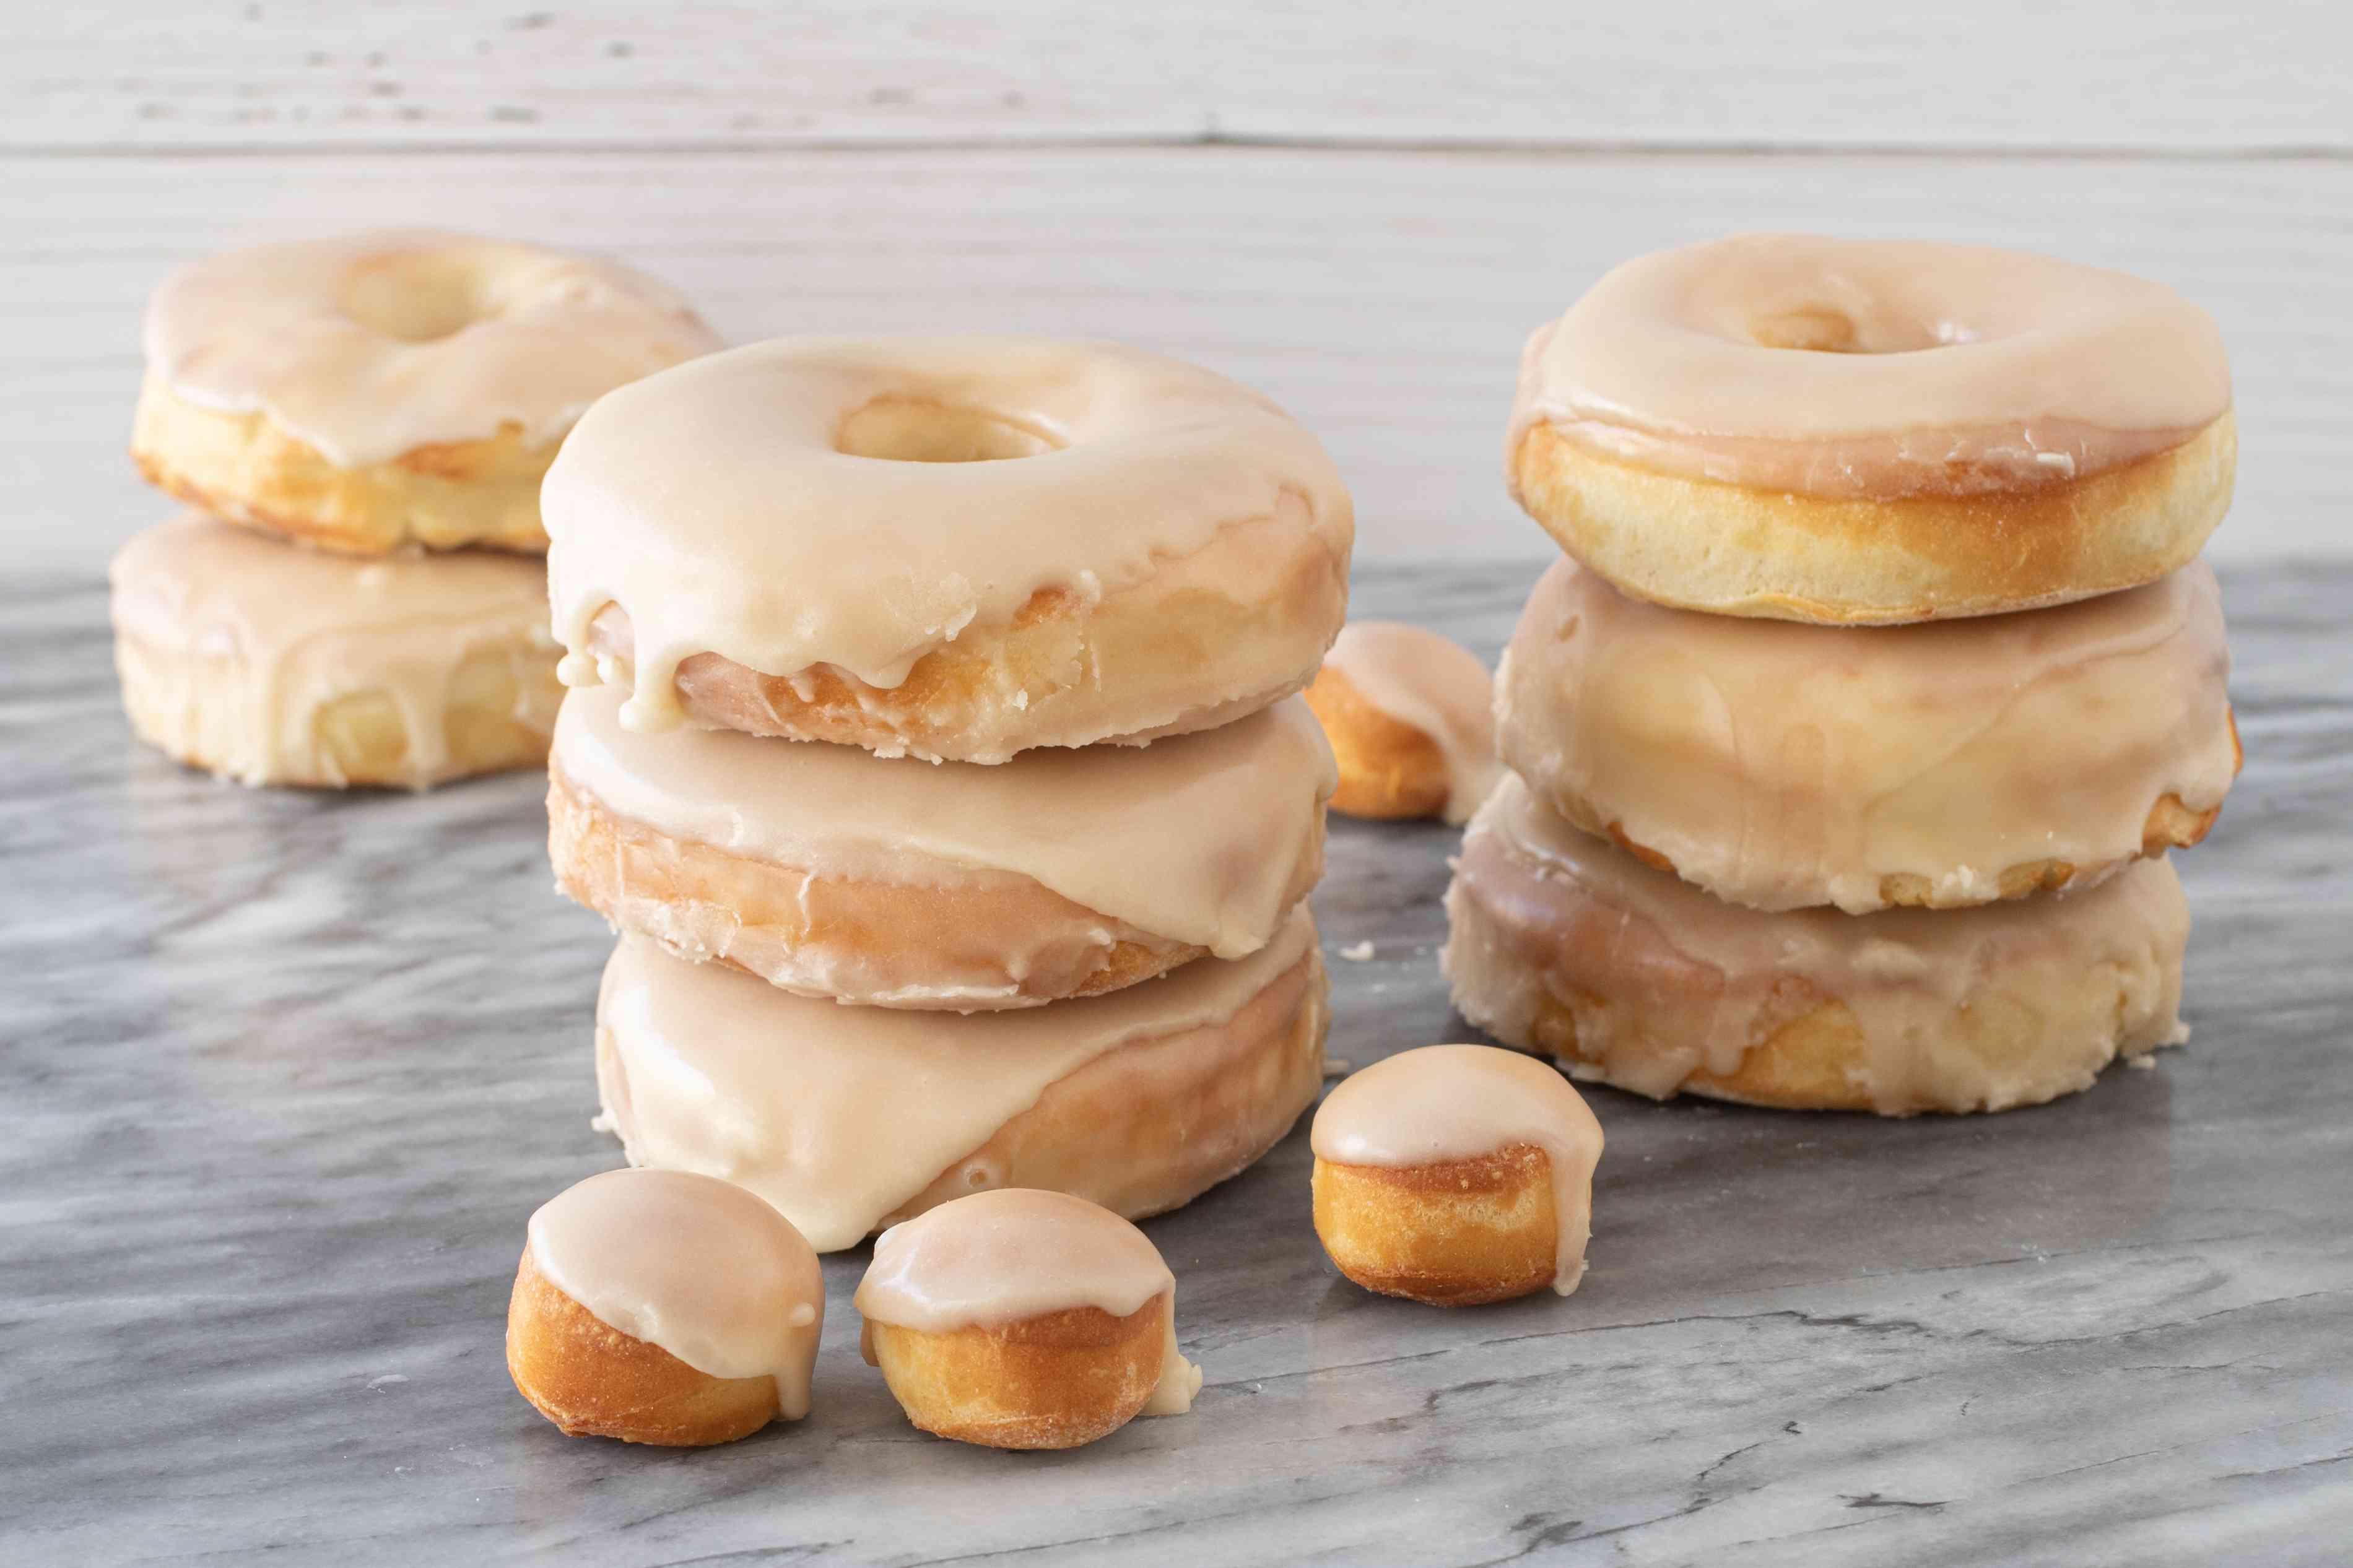 Stacks of air fryer doughnuts with vanilla glaze